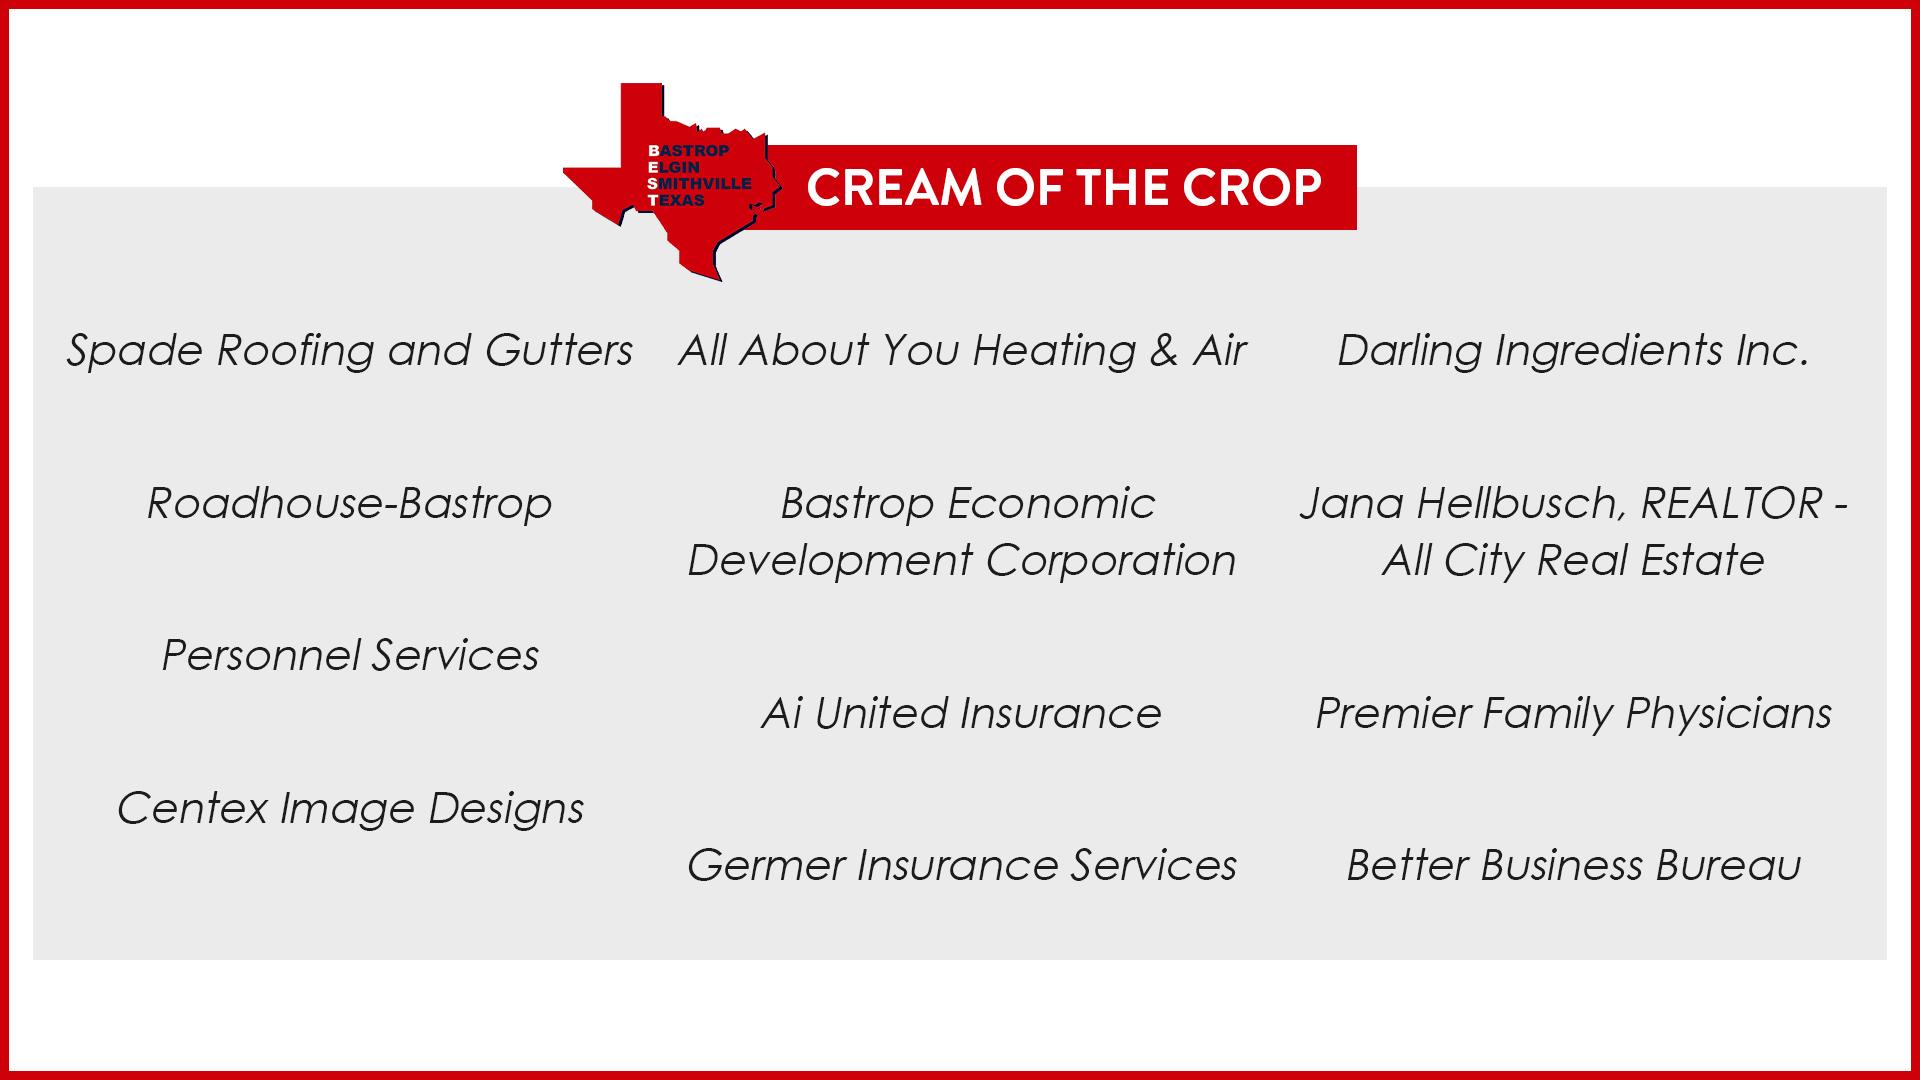 BEST Cream of the Crop